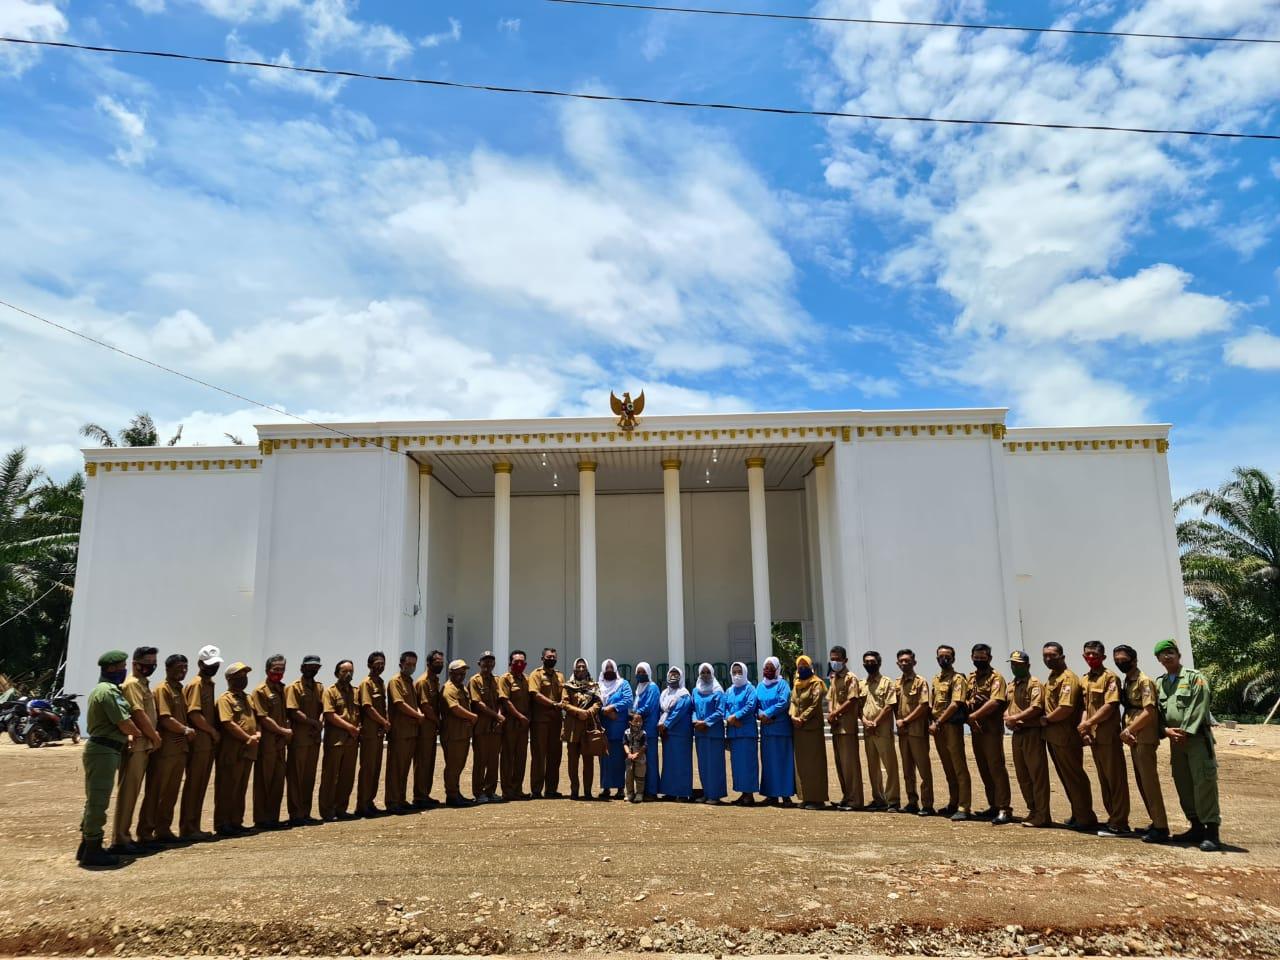 Kantor Desa Cempaka dibangun Bak Istana Negara, Ketua DPD RI : Itu Tidak Pantas, Seharusnya Utama Kepentingan Rakyat